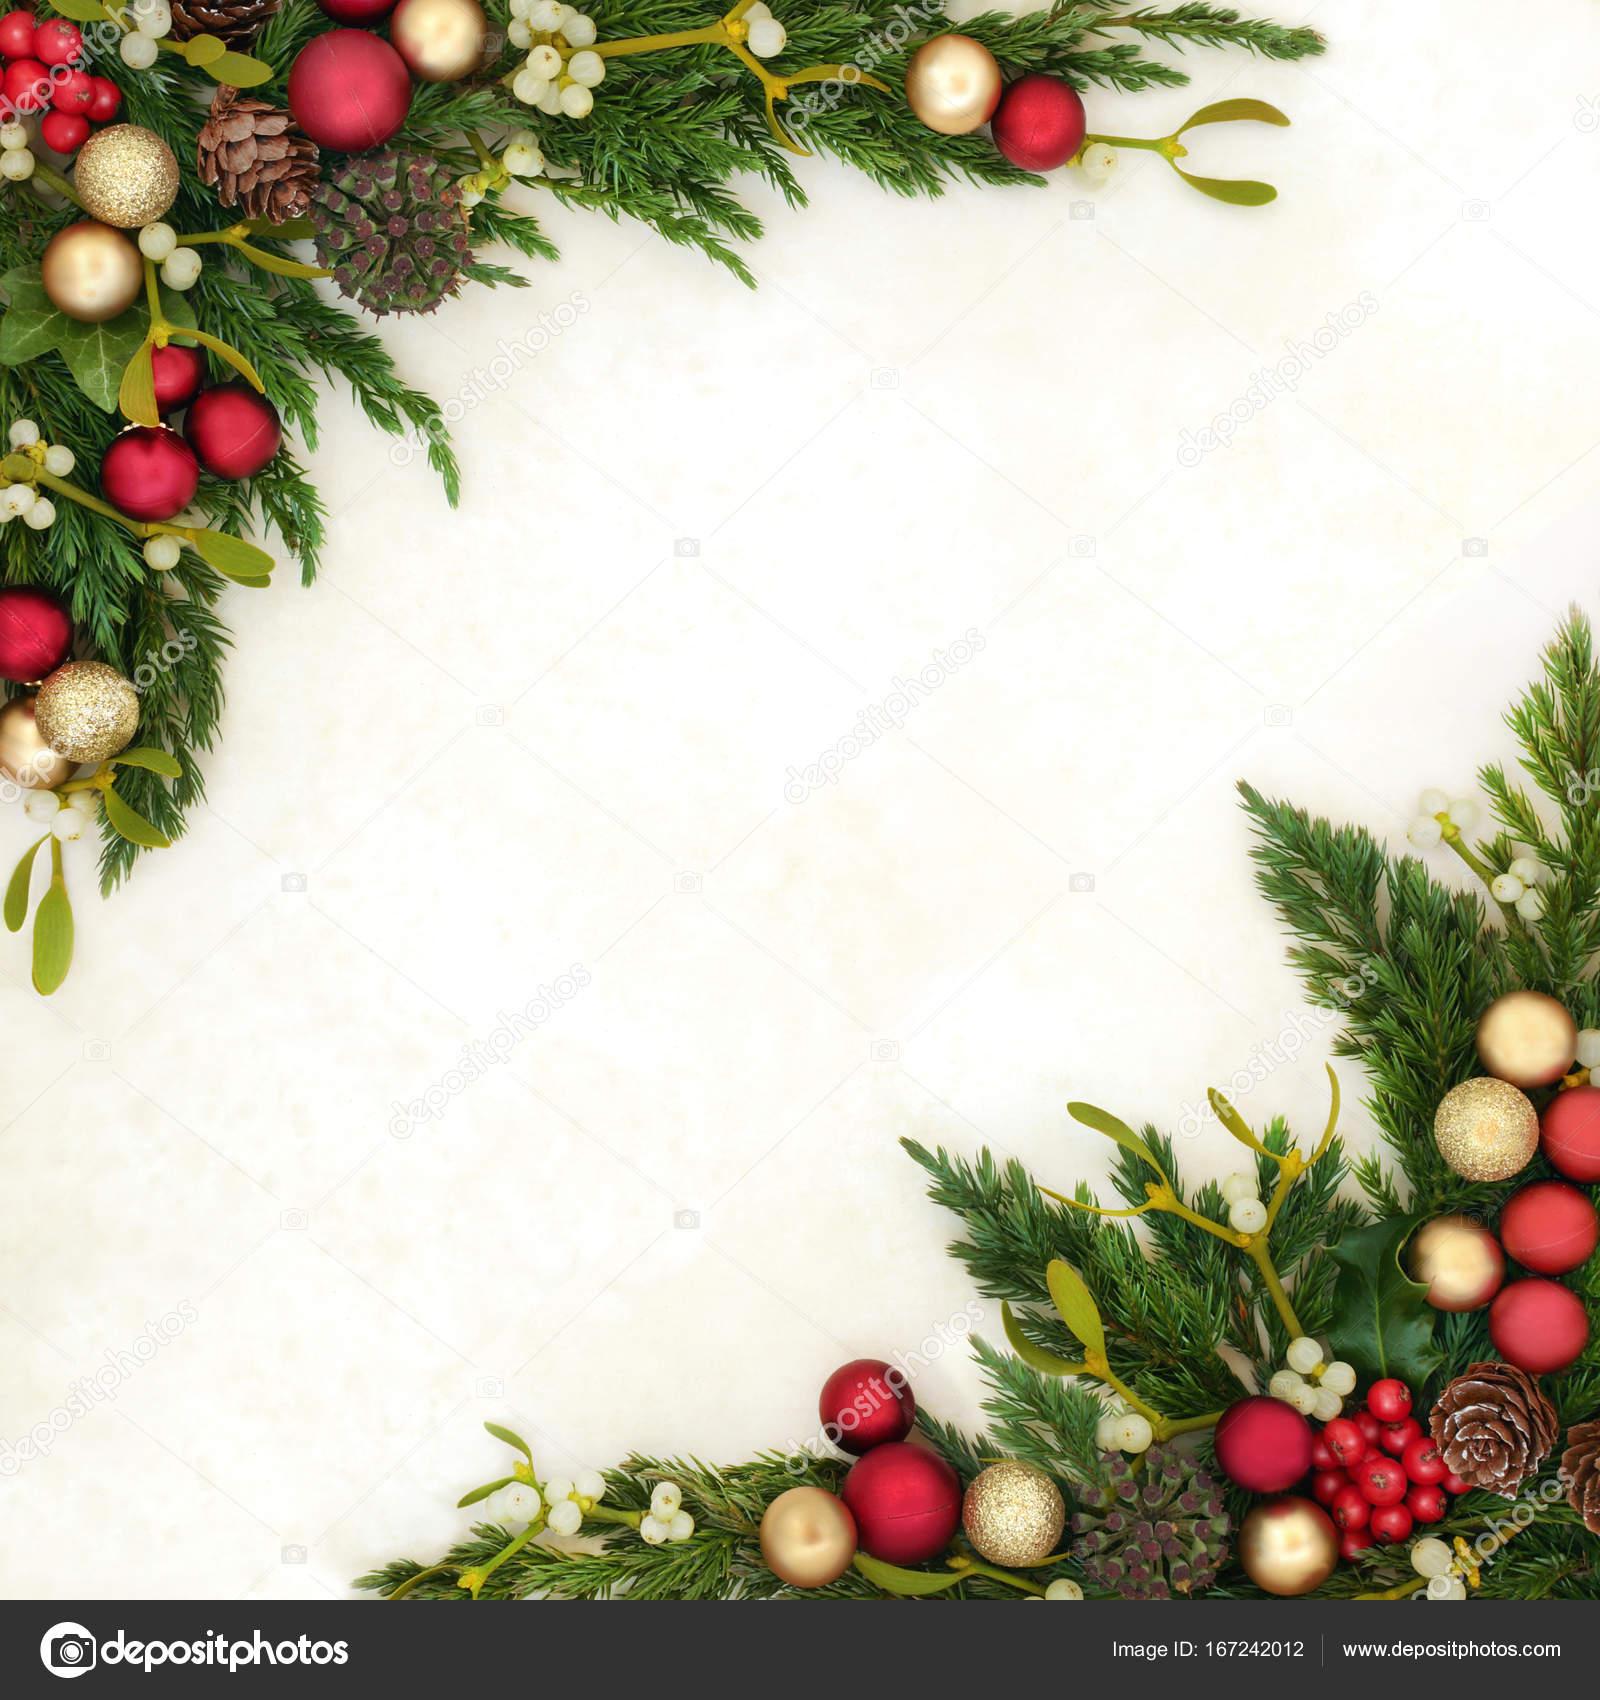 Christmas Boarder.Decorative Christmas Border Stock Photo C Marilyna 167242012